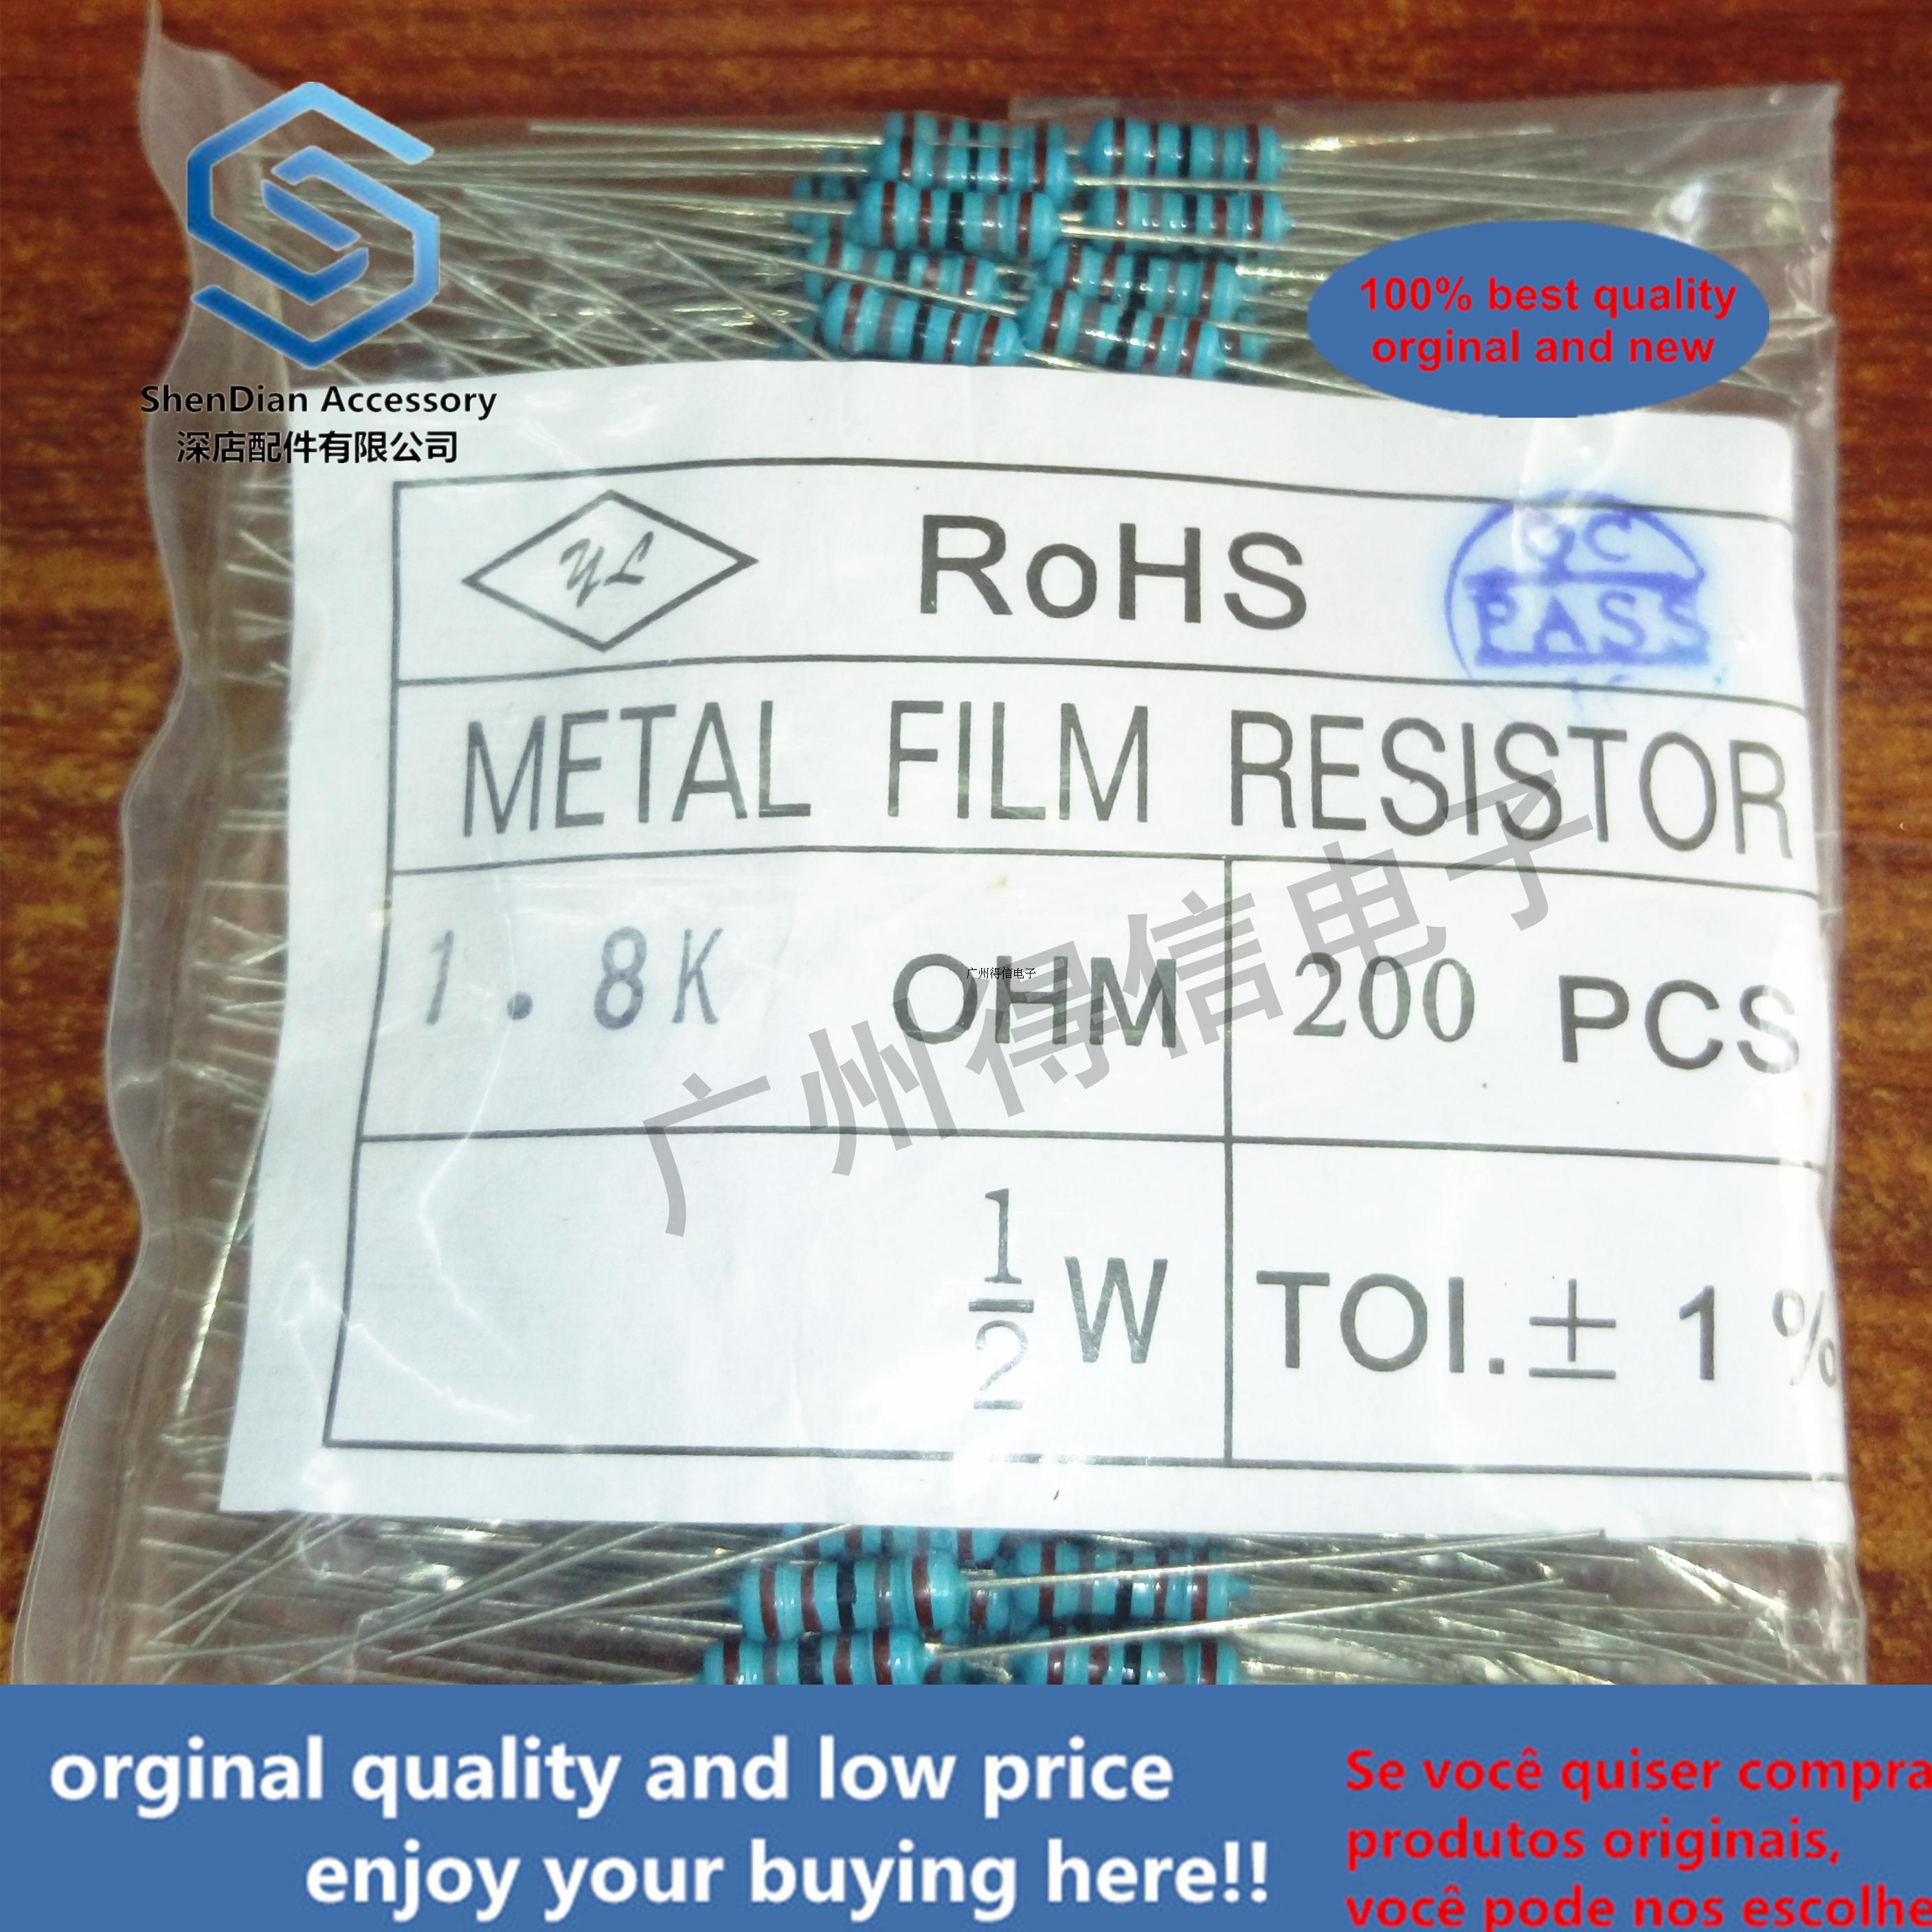 200pcs 1 / 2W 910R 910 Euro 1% Brand New Metal Film Iron Feet Resistor Bag 200 Pcs Per Pack